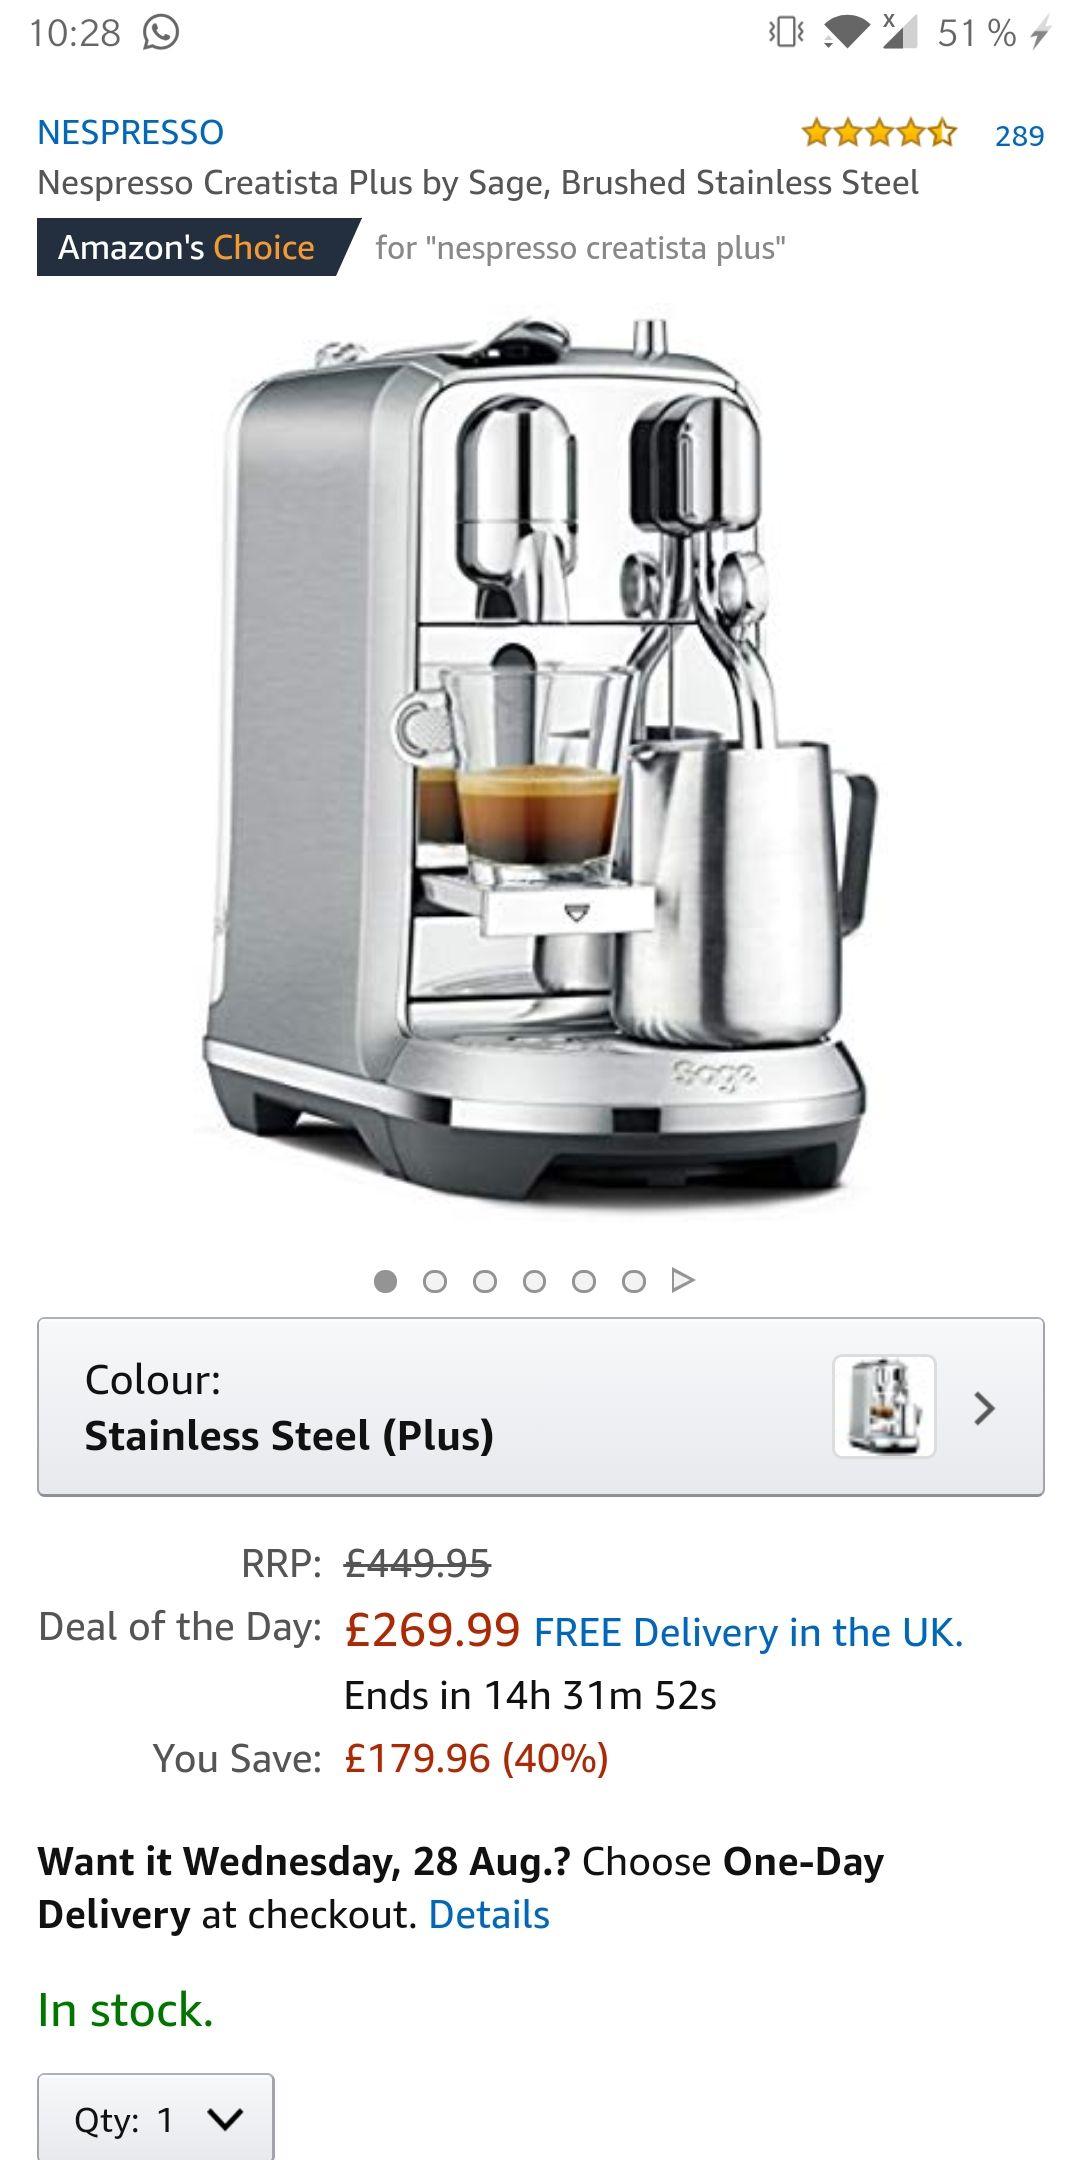 [Amazon UK] Nespresso Creatista Plus by Sage